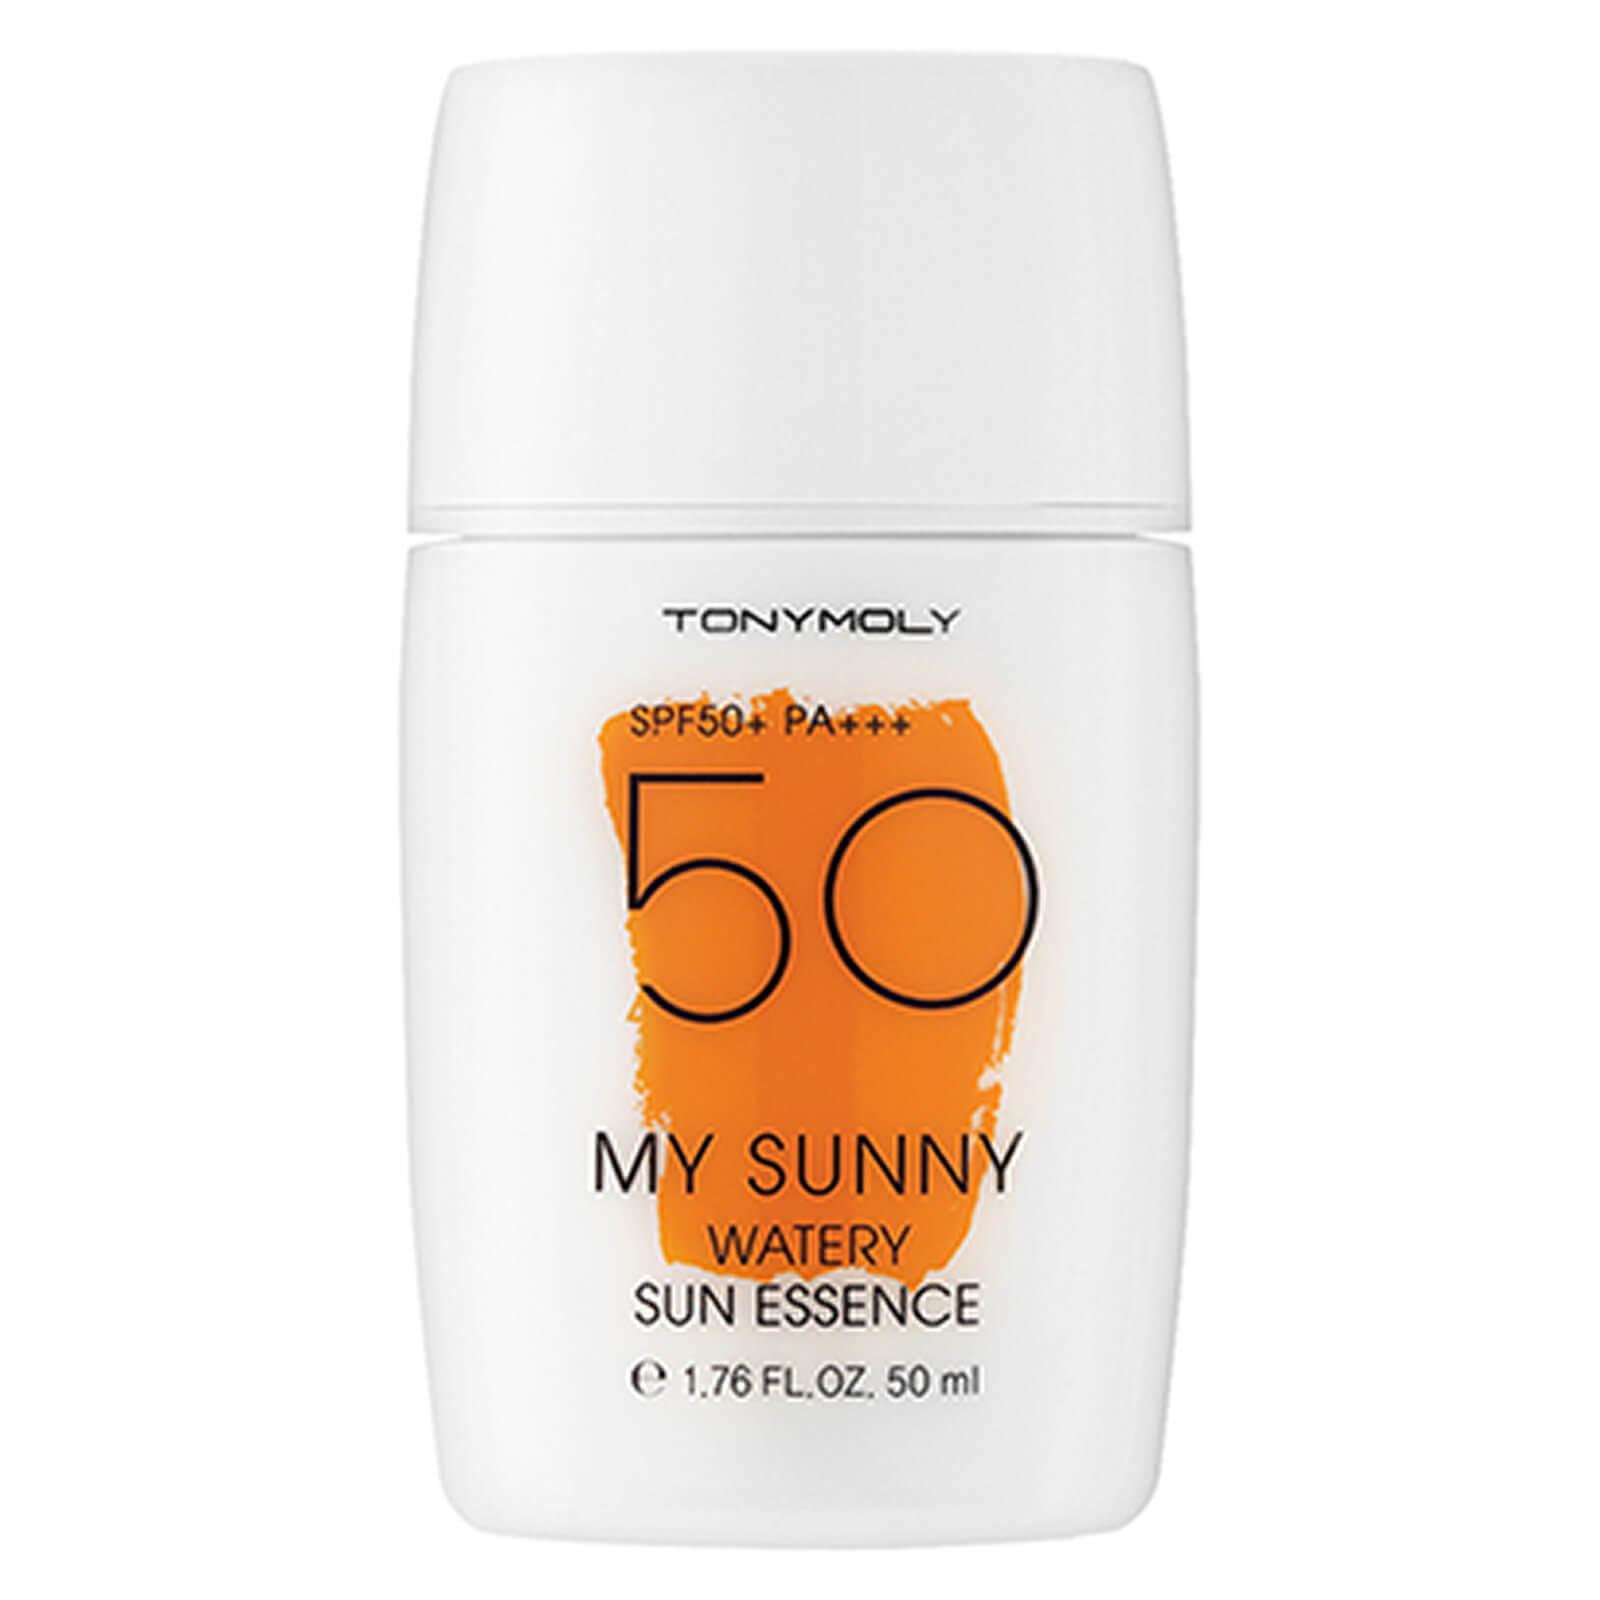 7cc22fd7f3 TONYMOLY My Sunny Watery Sun Essence SPF 50+ Pa+++